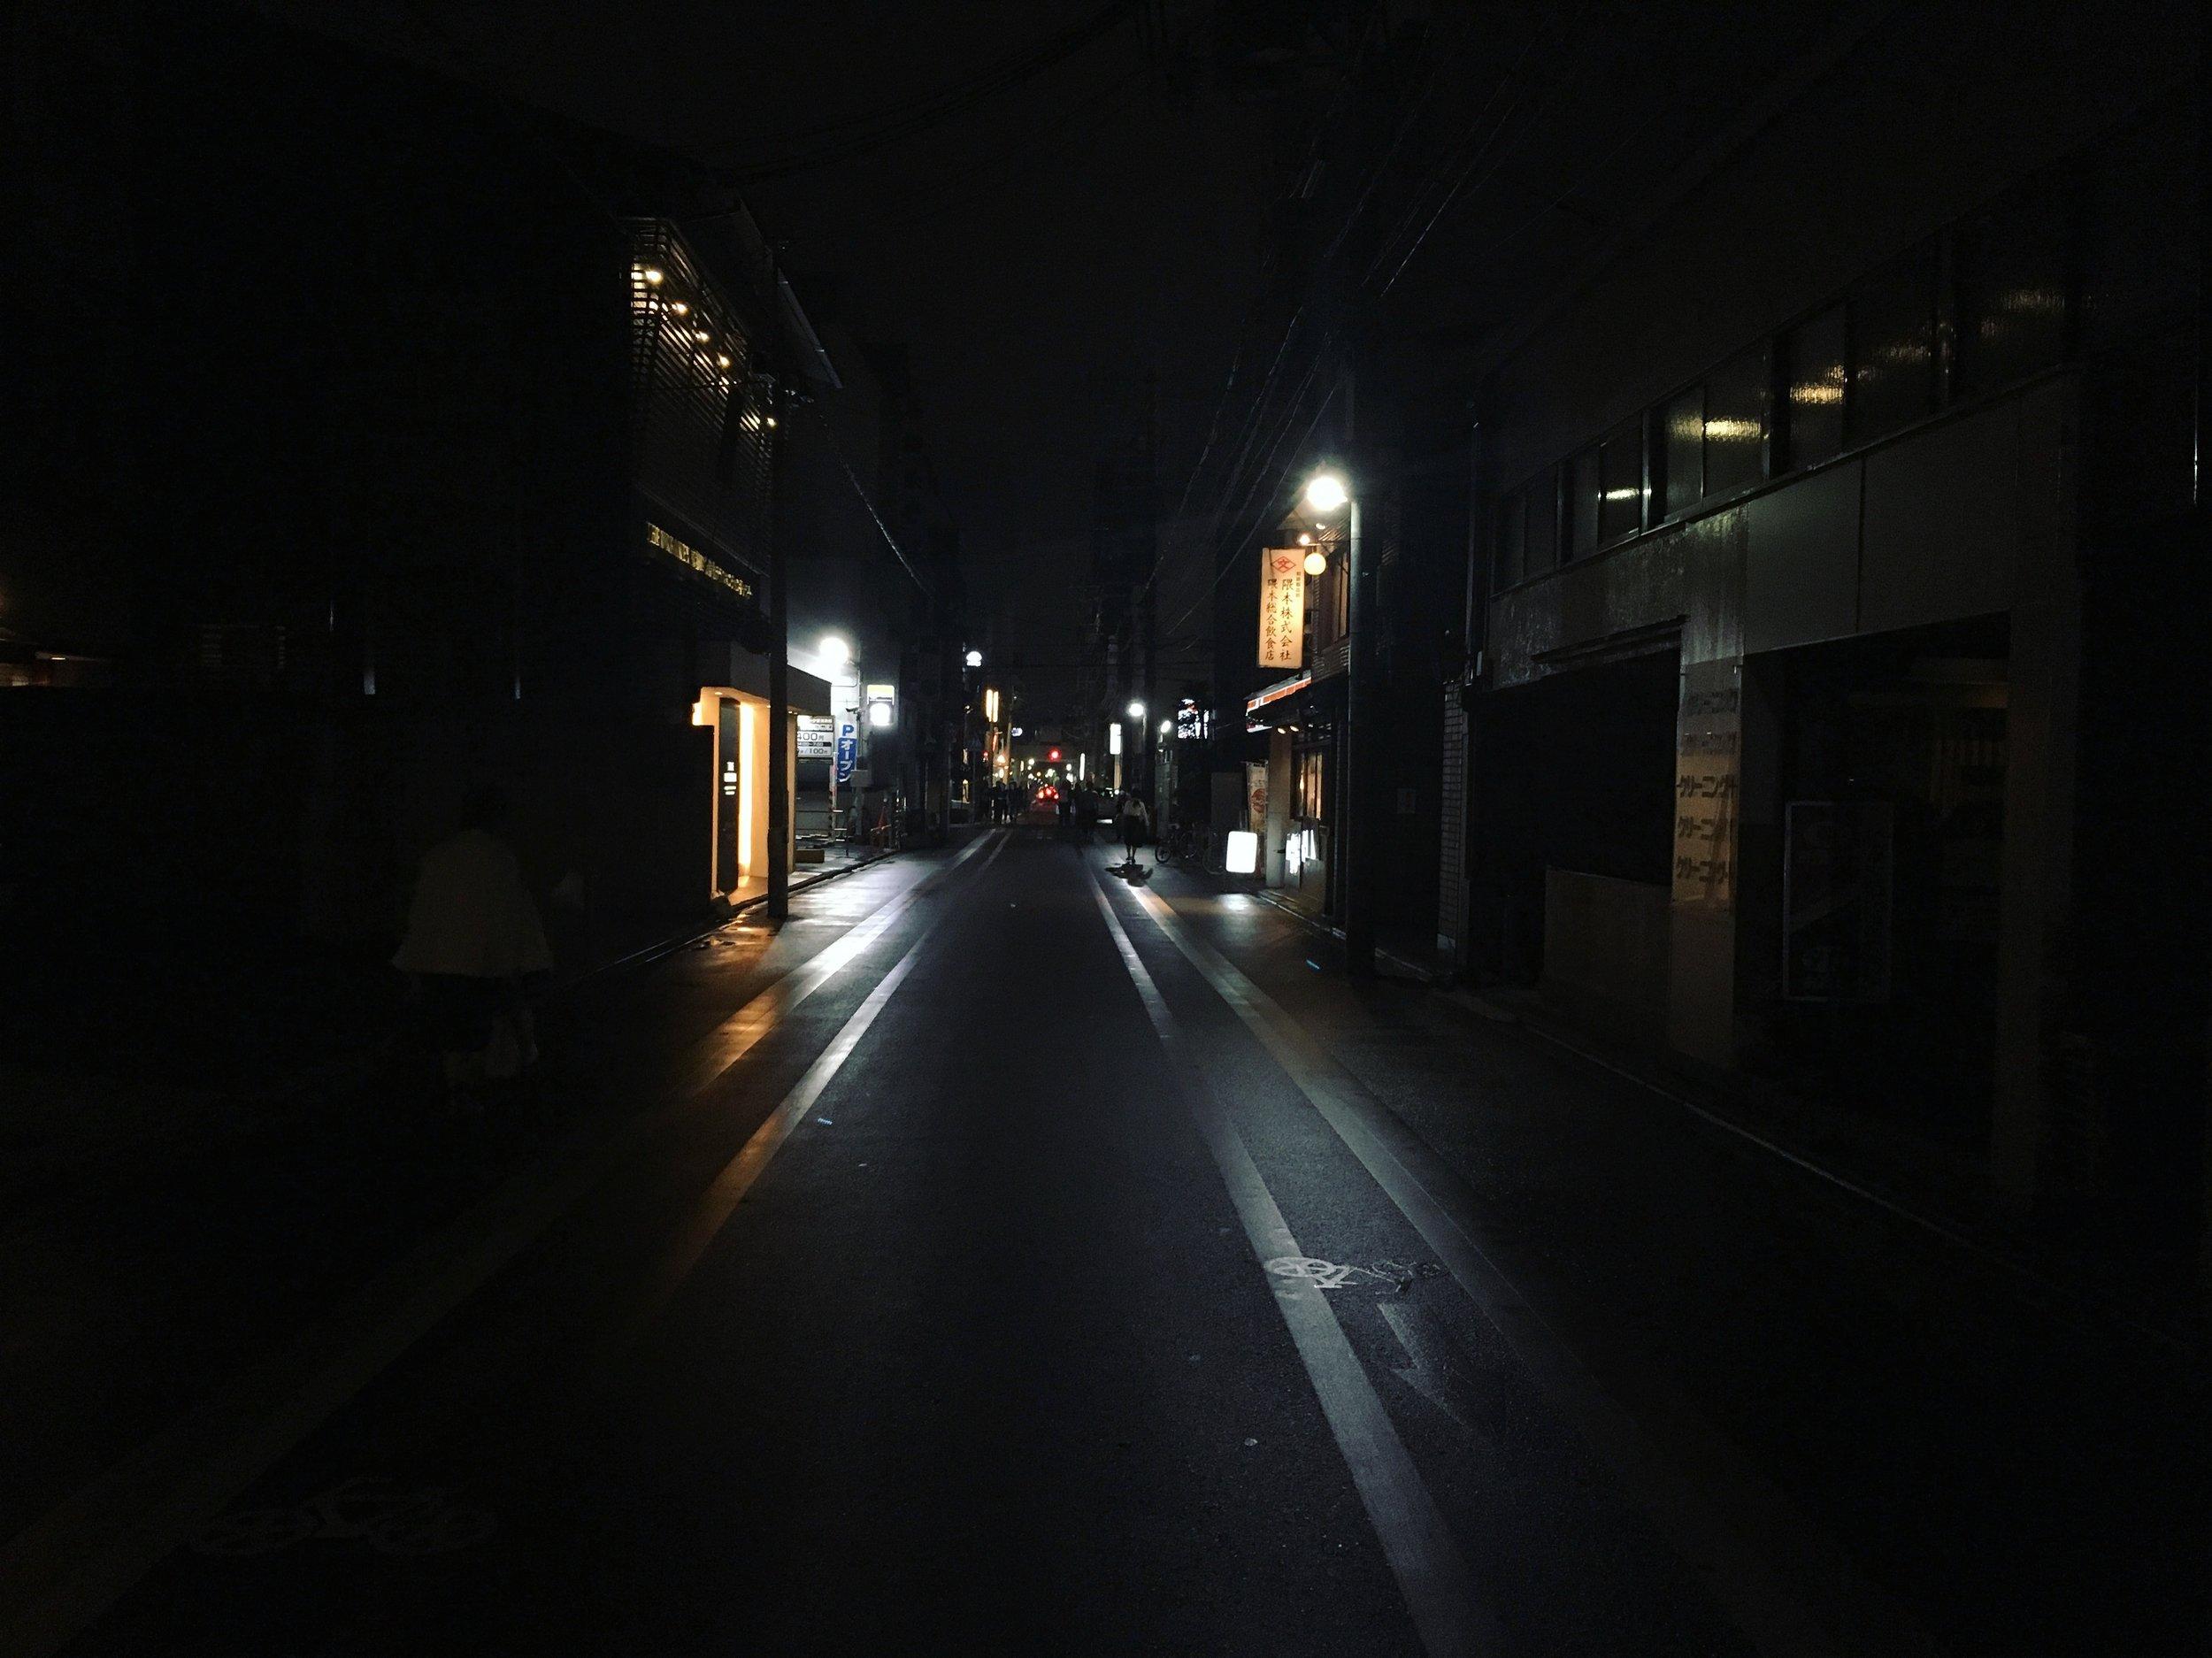 japan_lkbkjpnec_30.jpeg